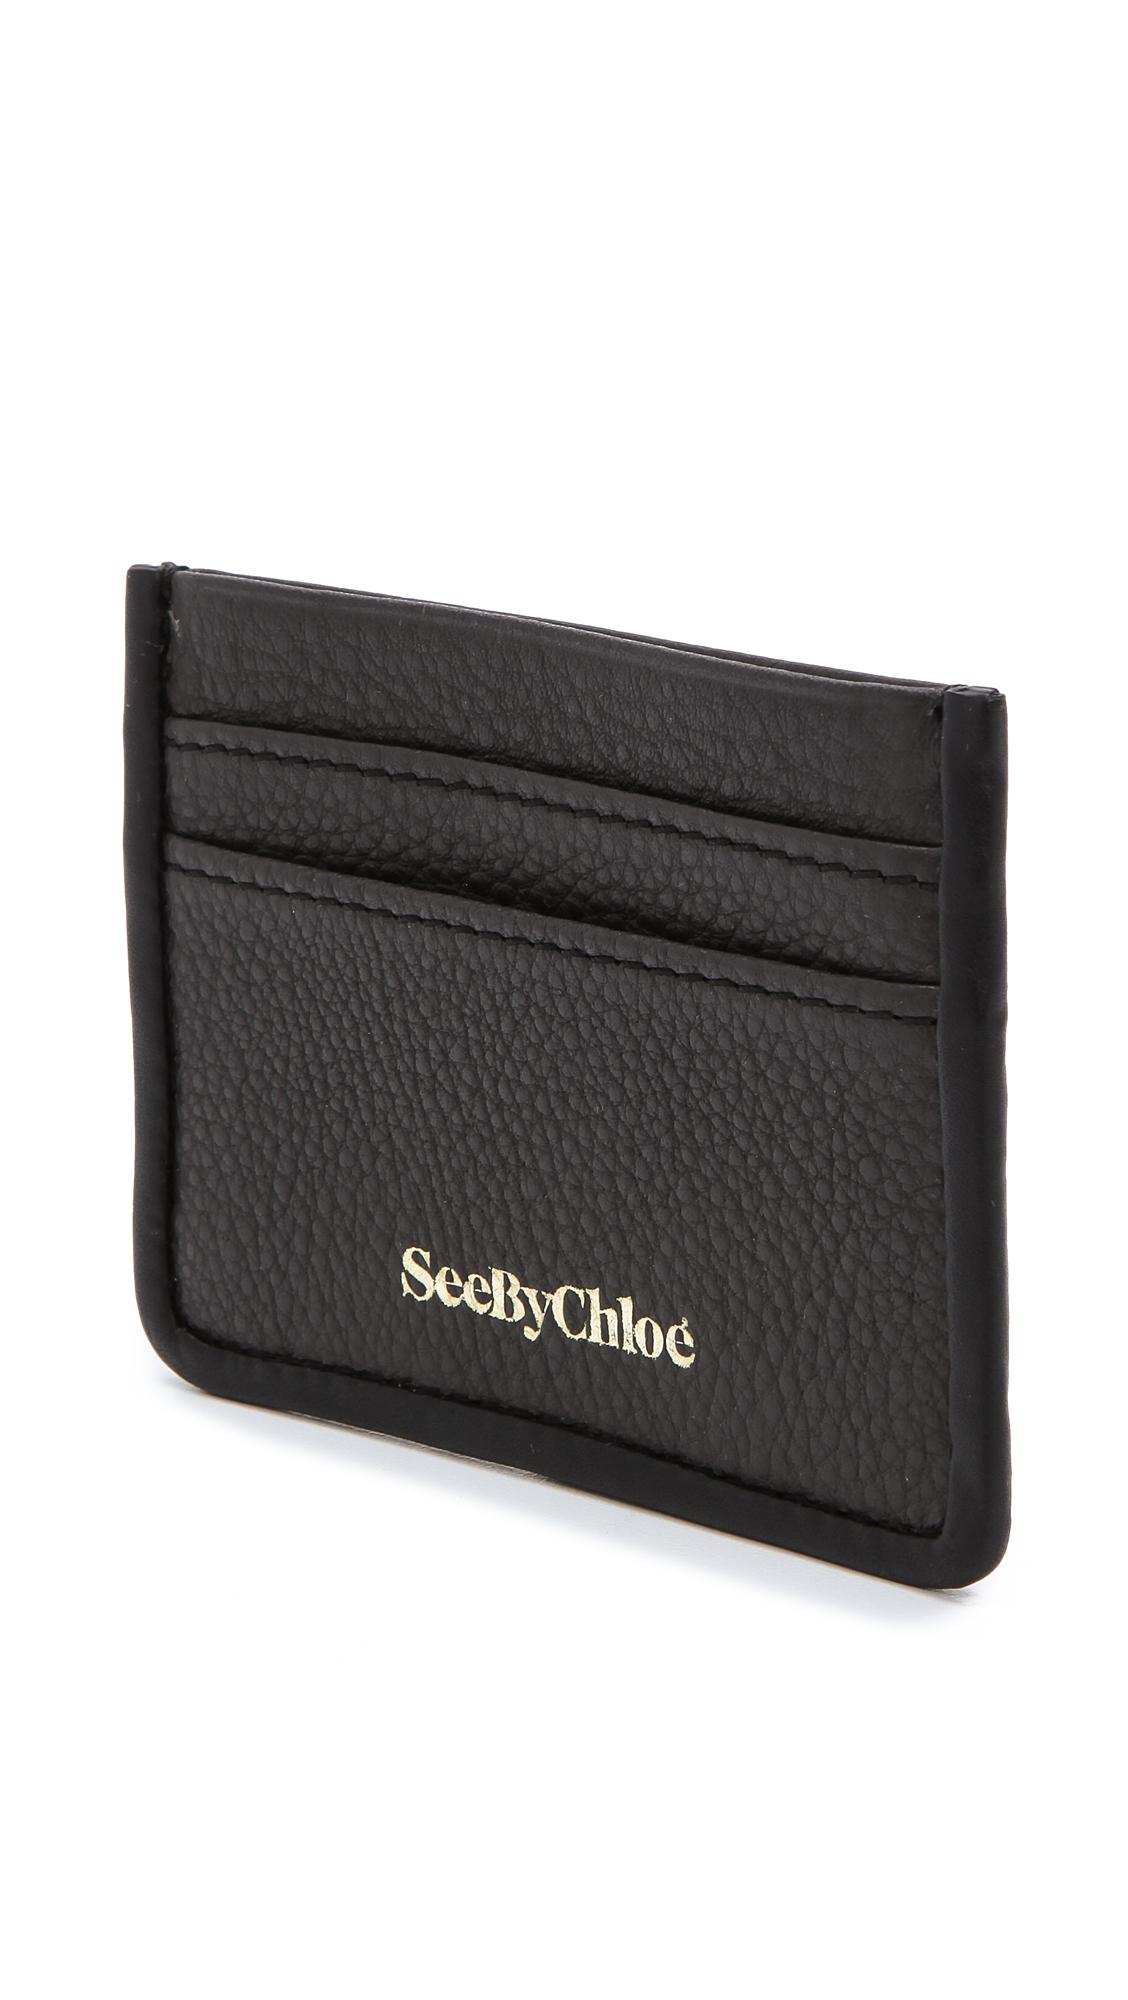 see by chloe april pass card holder shopbop - Chloe Card Holder